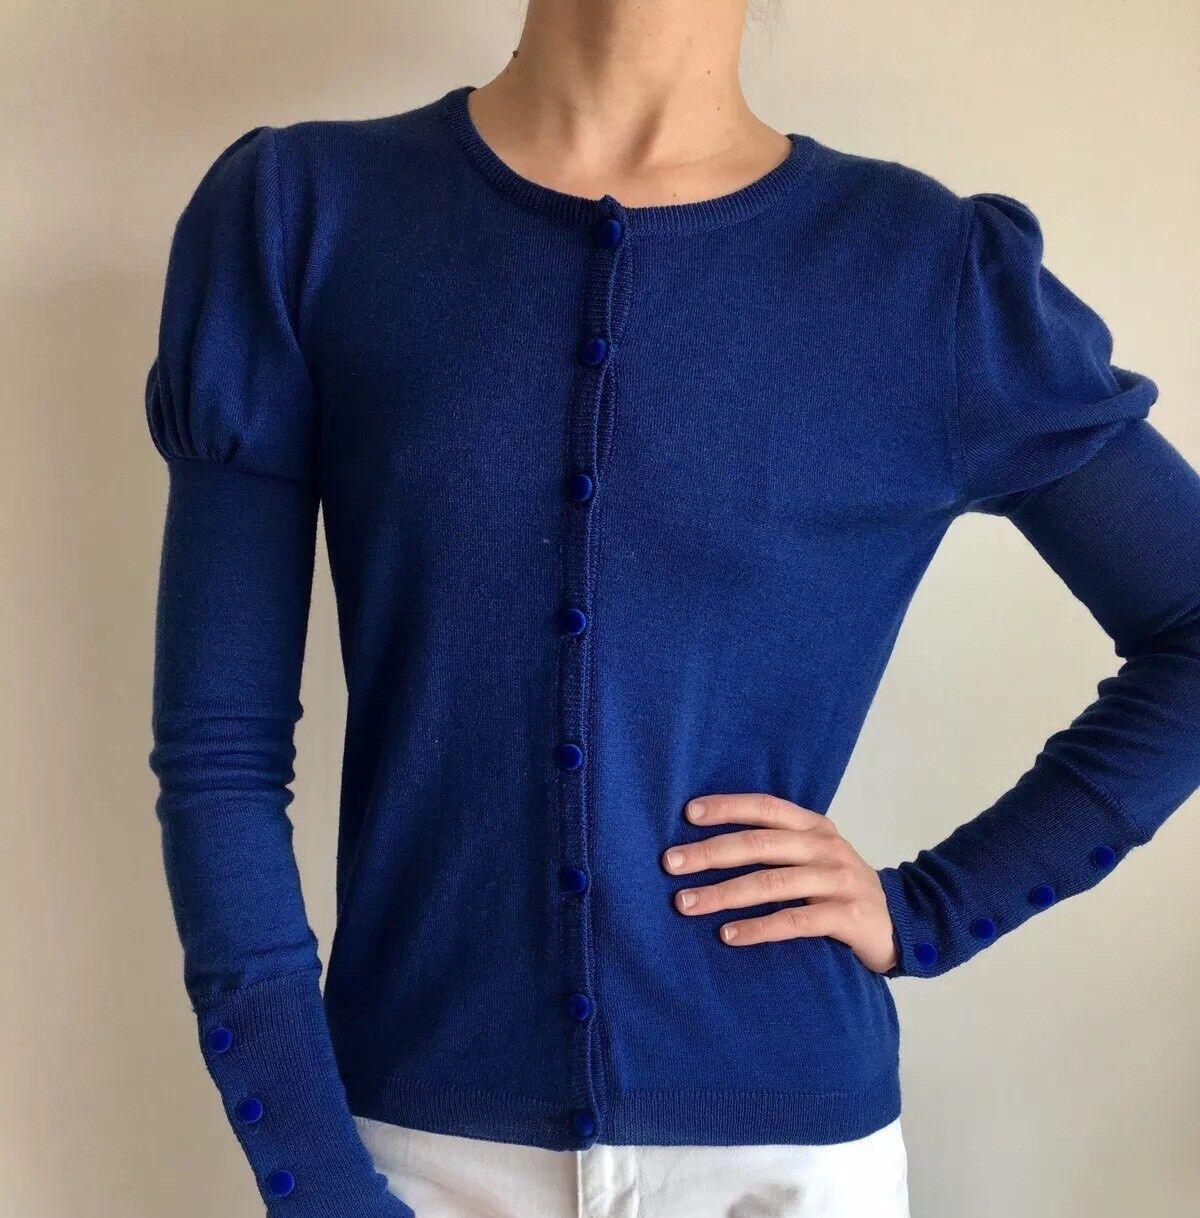 blueEGIRL blueMARINE () Sapphire bluee Wool Long Cap Sleeve Cardigan I40 F34 XS